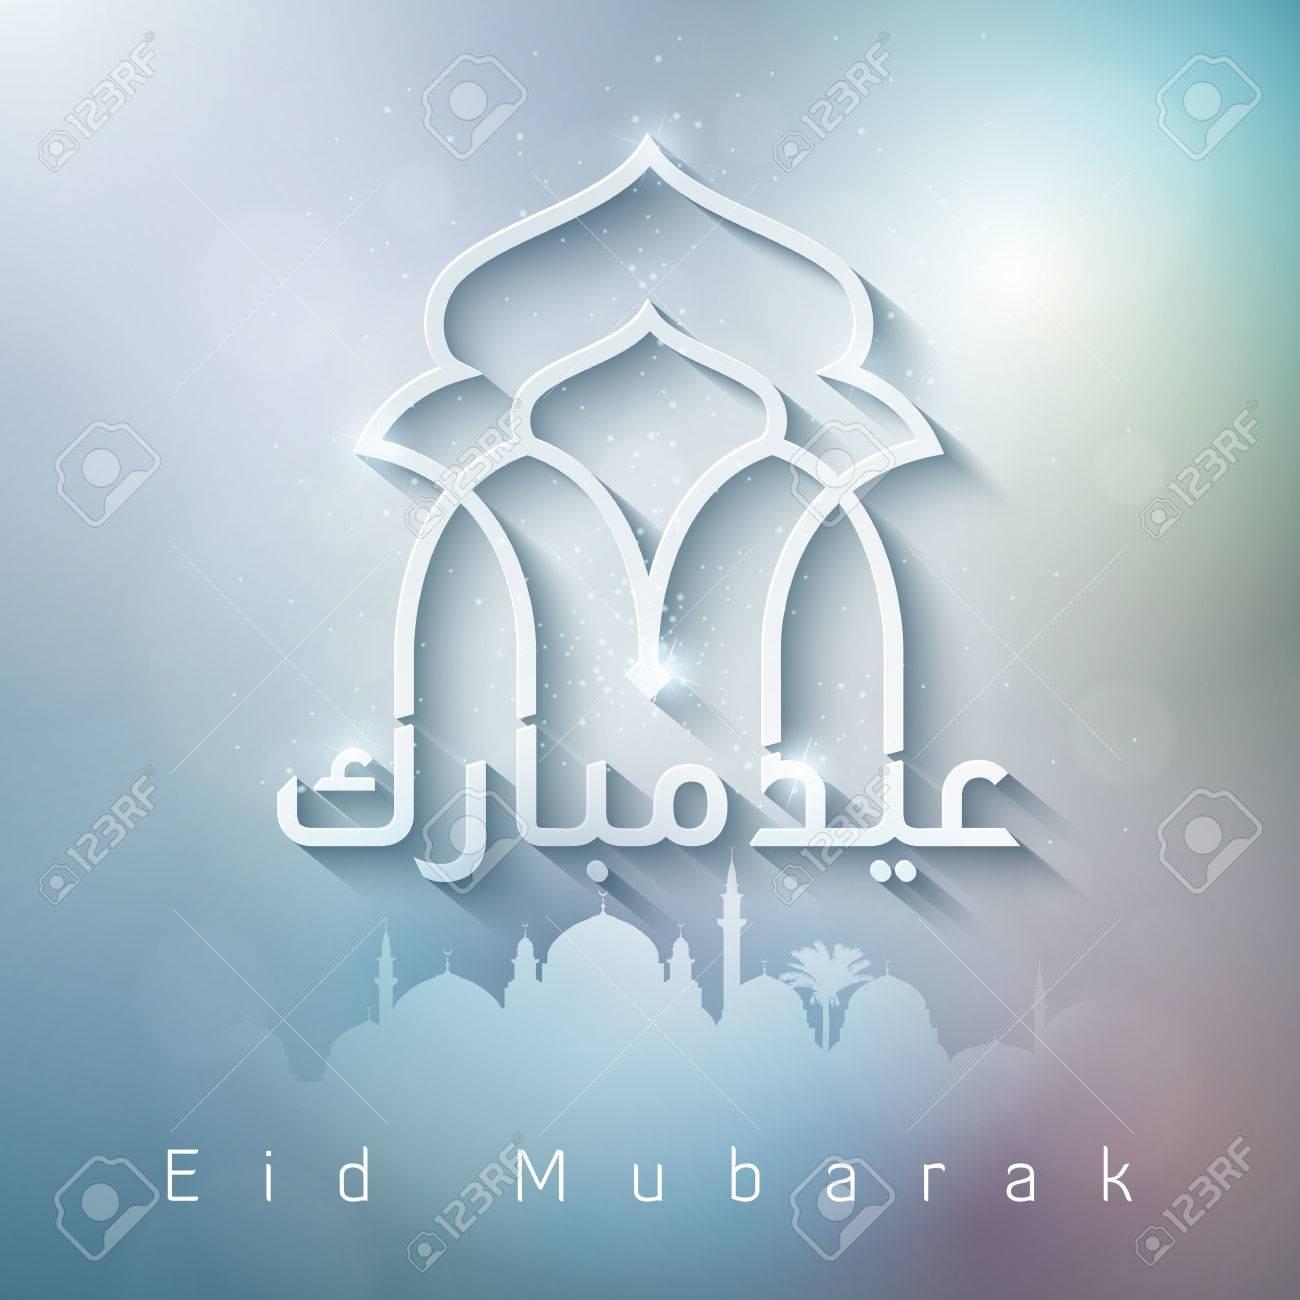 Eid Mubarak islamic calligraphy mosque silhouette for greeting card - 56800827